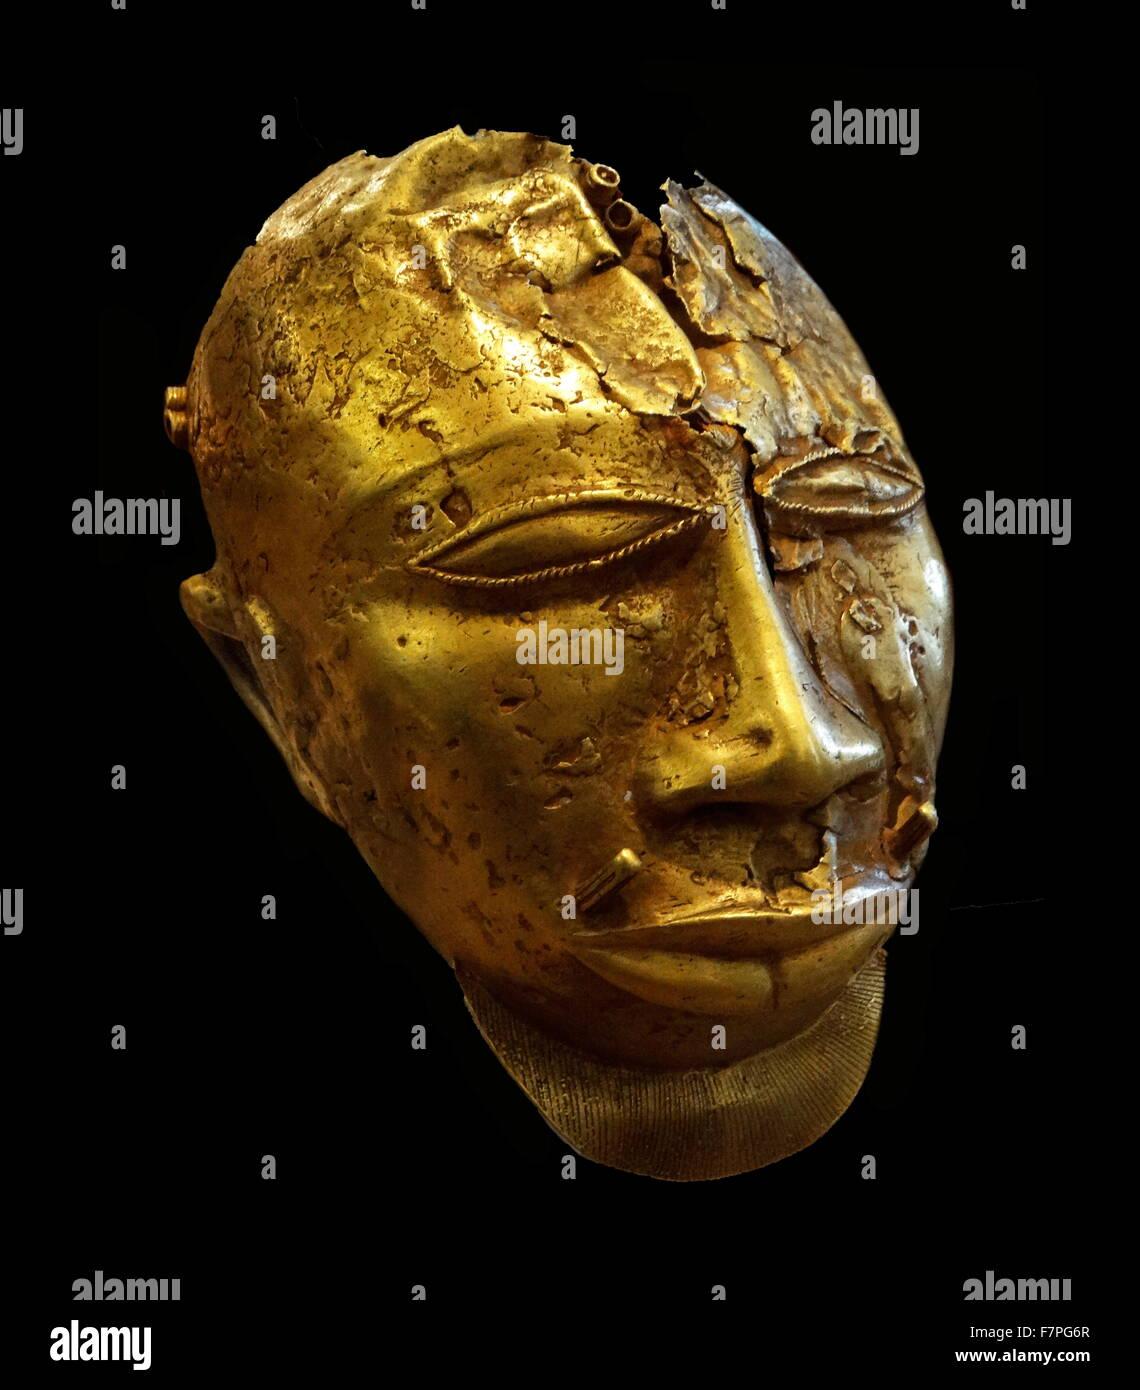 Part of the Treasure of Kofi-Karikari, King of Ashanti, present-day Ghana Stock Photo